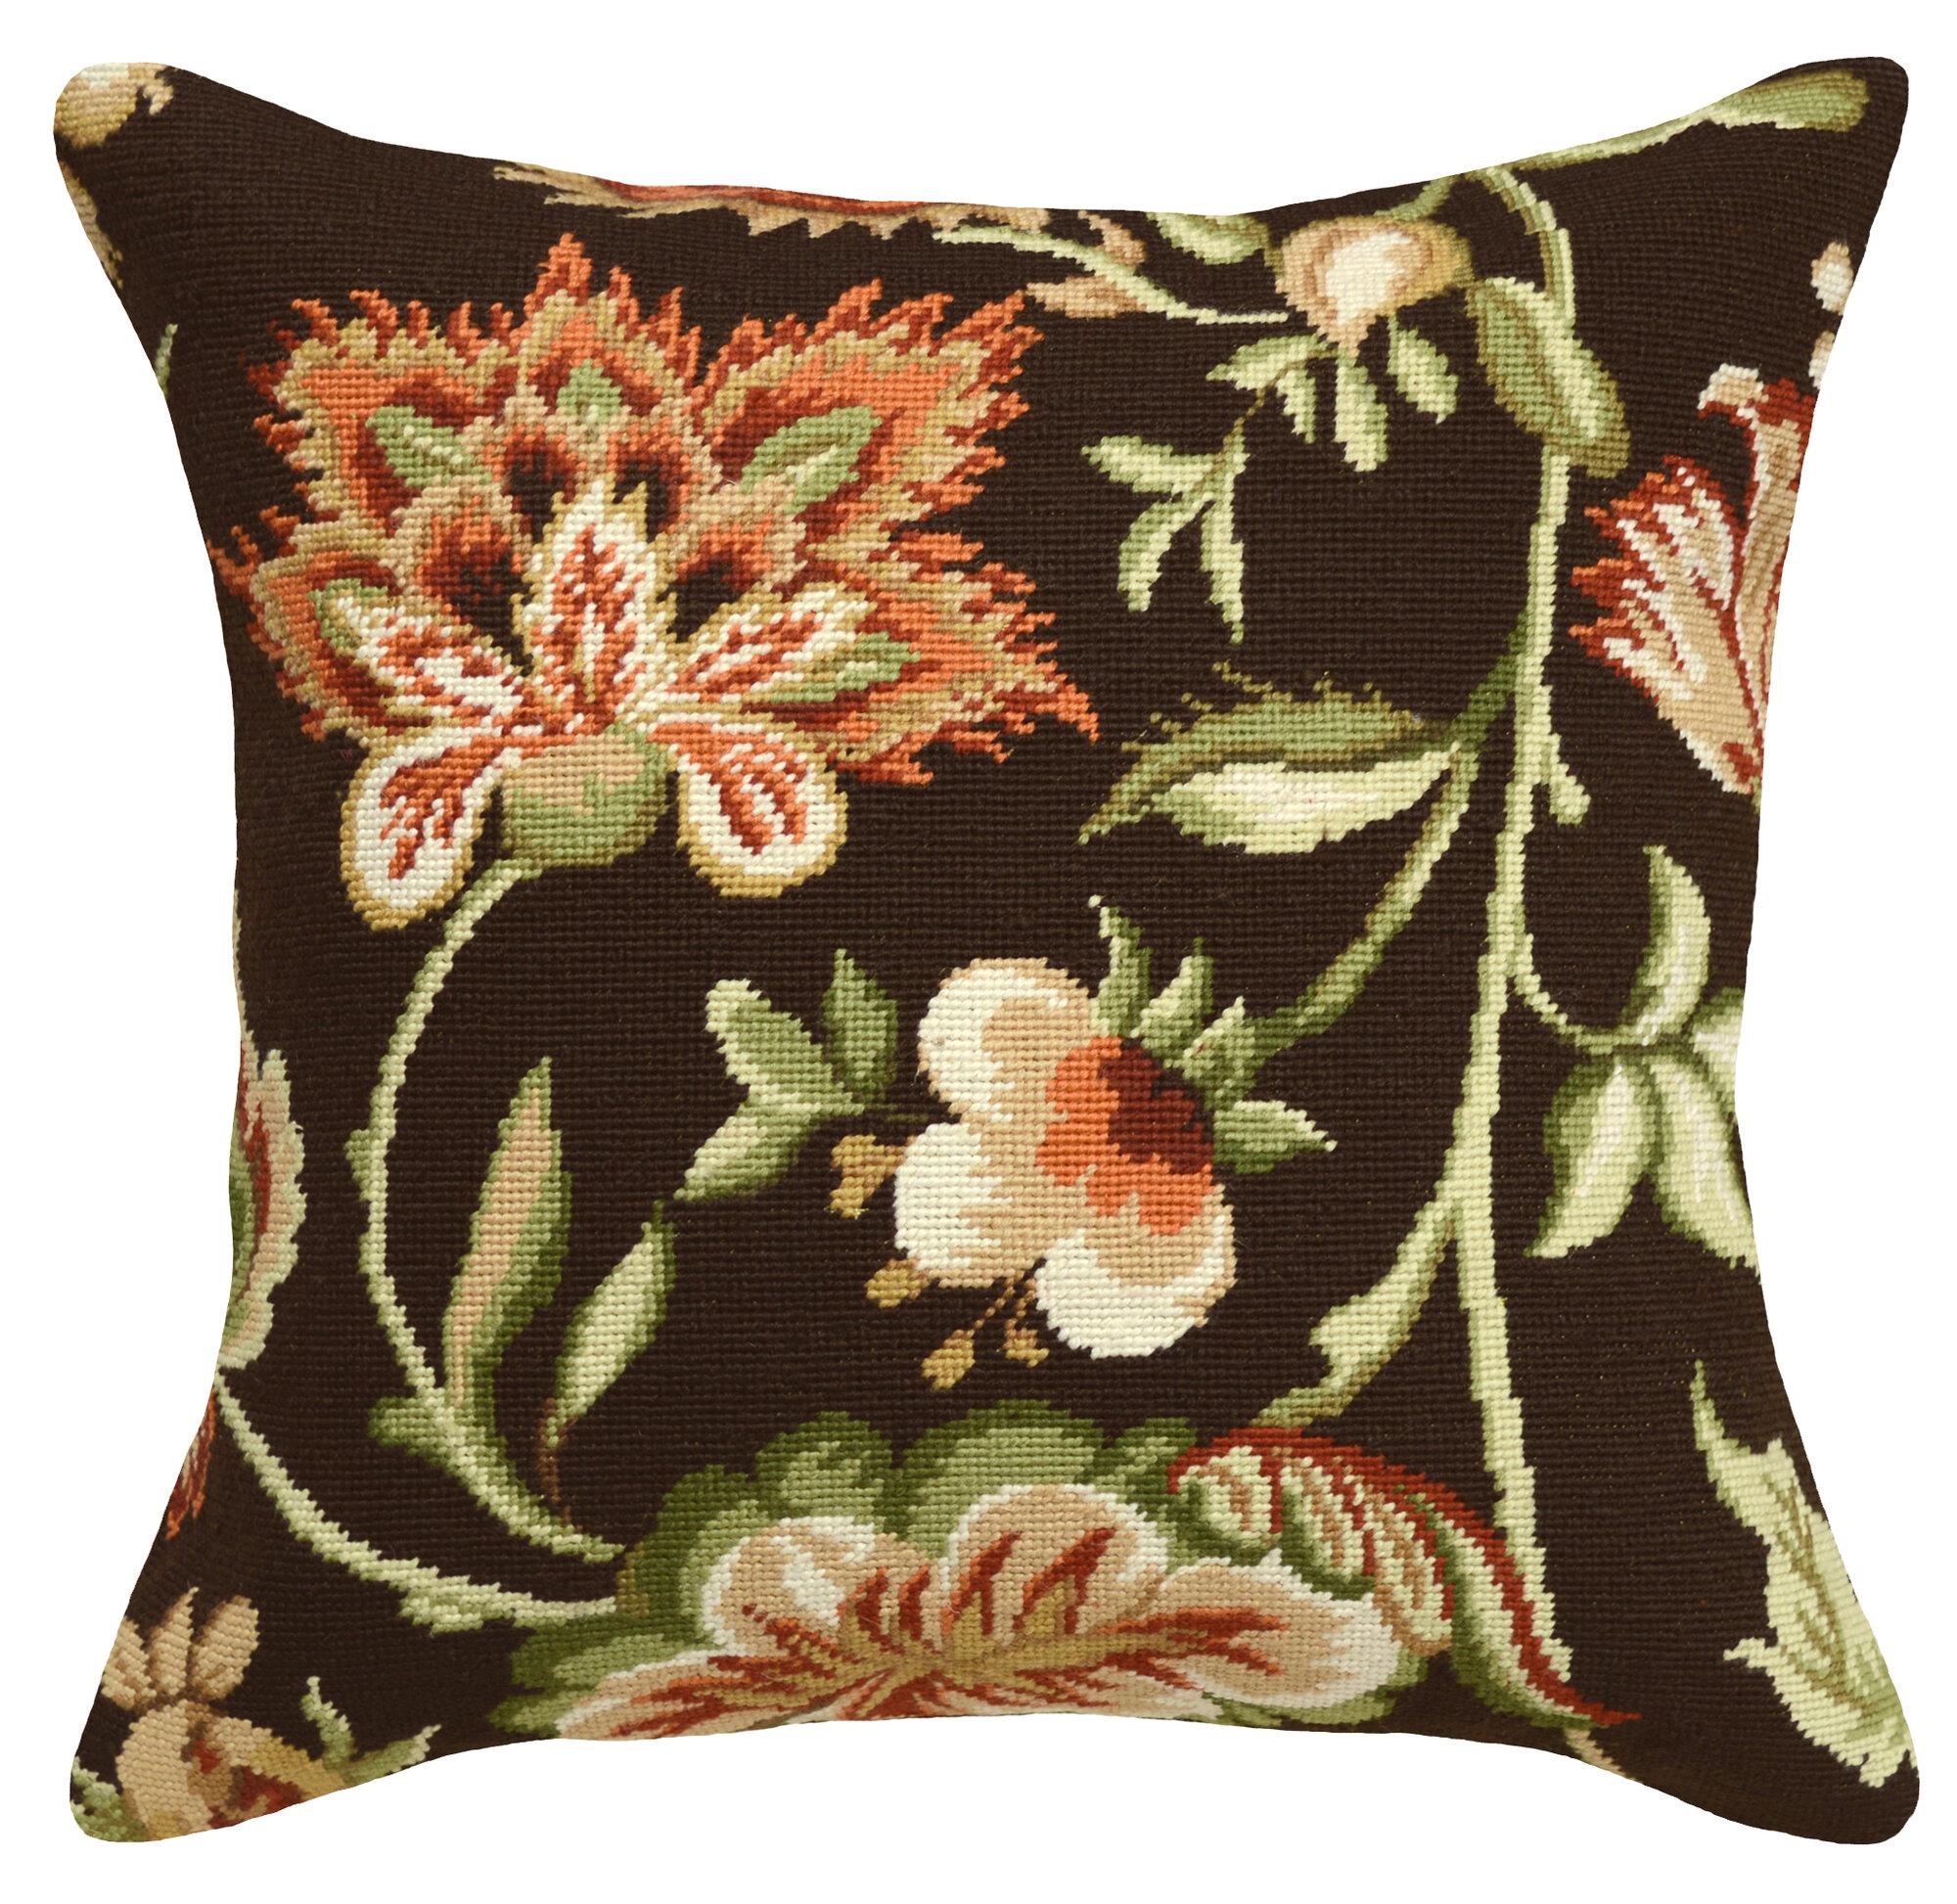 123 Creations Jacobean Floral Needlepoint Wool Throw Pillow eBay